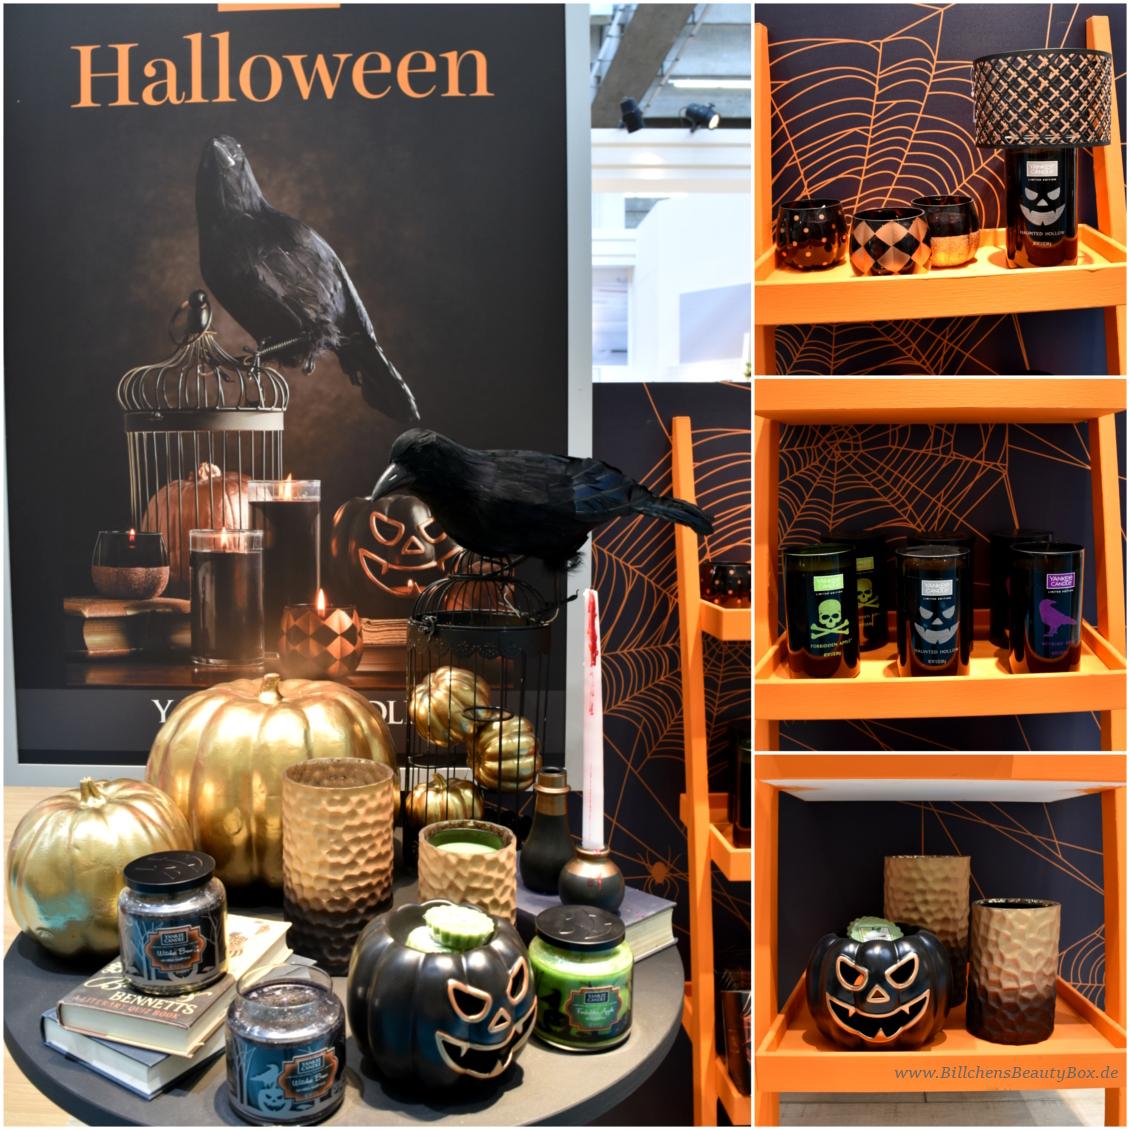 Yankee Candle - Halloween 2017 Kollektion, Düfte, Accessoires und Duftbeschreibungen